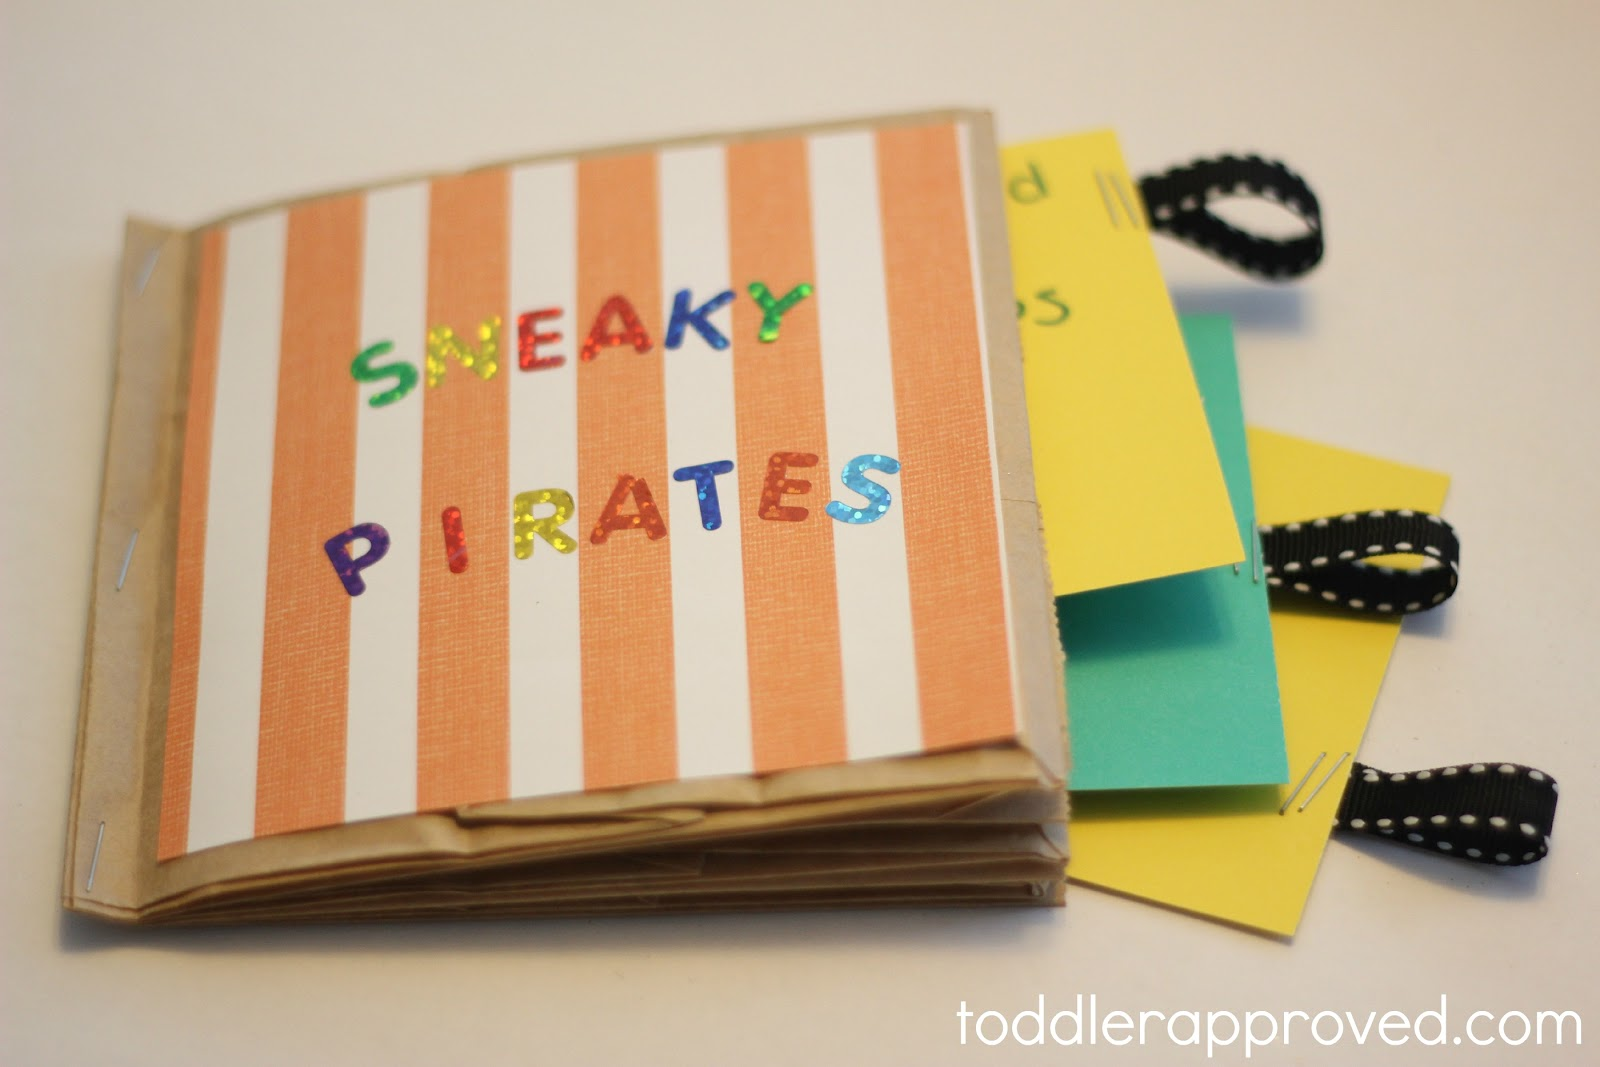 http://4.bp.blogspot.com/-BHWJHdRqDYA/T6i3UJwxNoI/AAAAAAAA-lE/AP2bJPty7Zw/s1600/sneaky+pirates.jpg